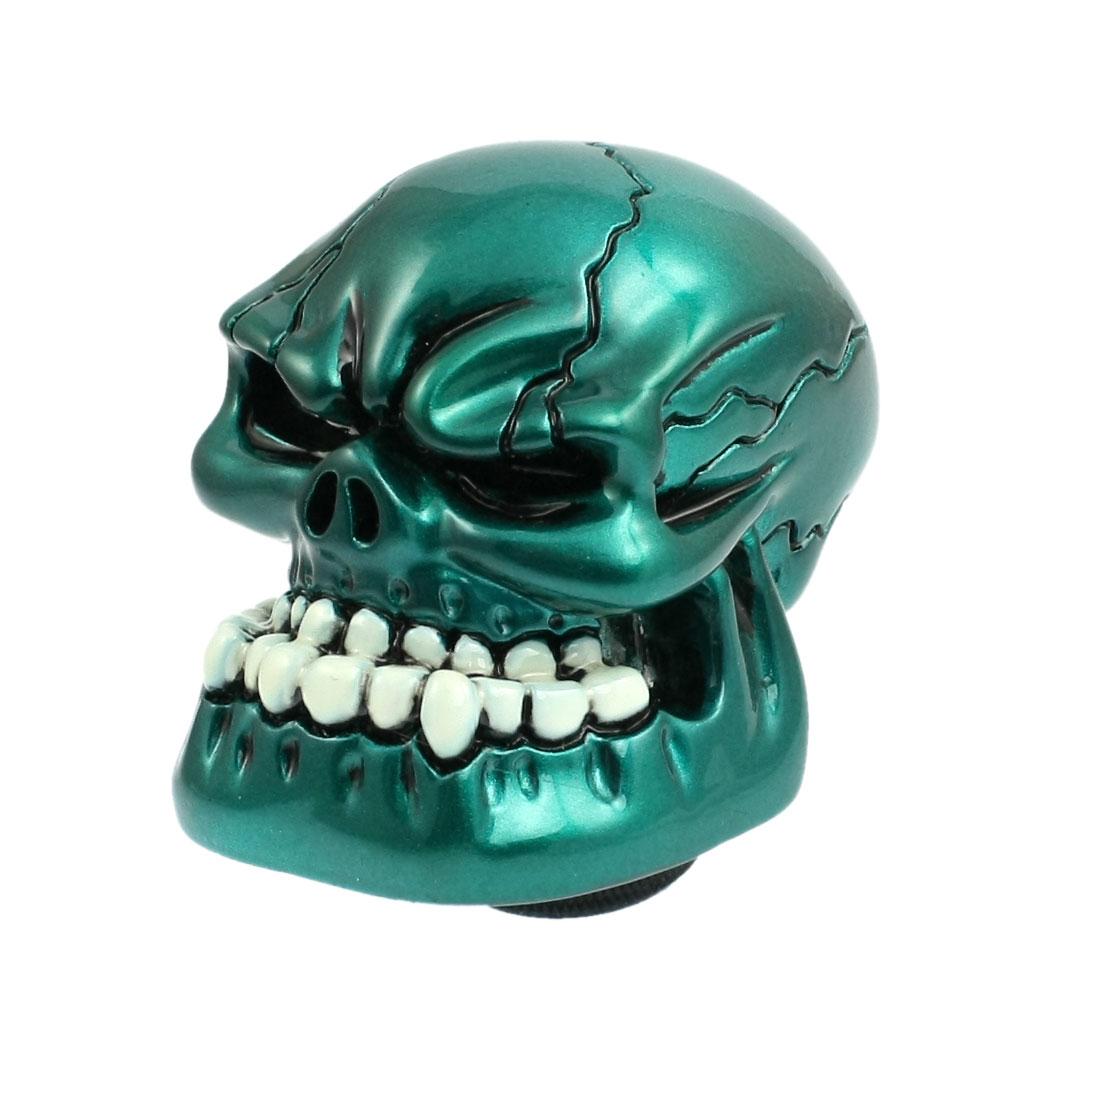 Universal Car Truck Human Wicked Skull Stick Shift Gear Shifter Knob Teal Blue